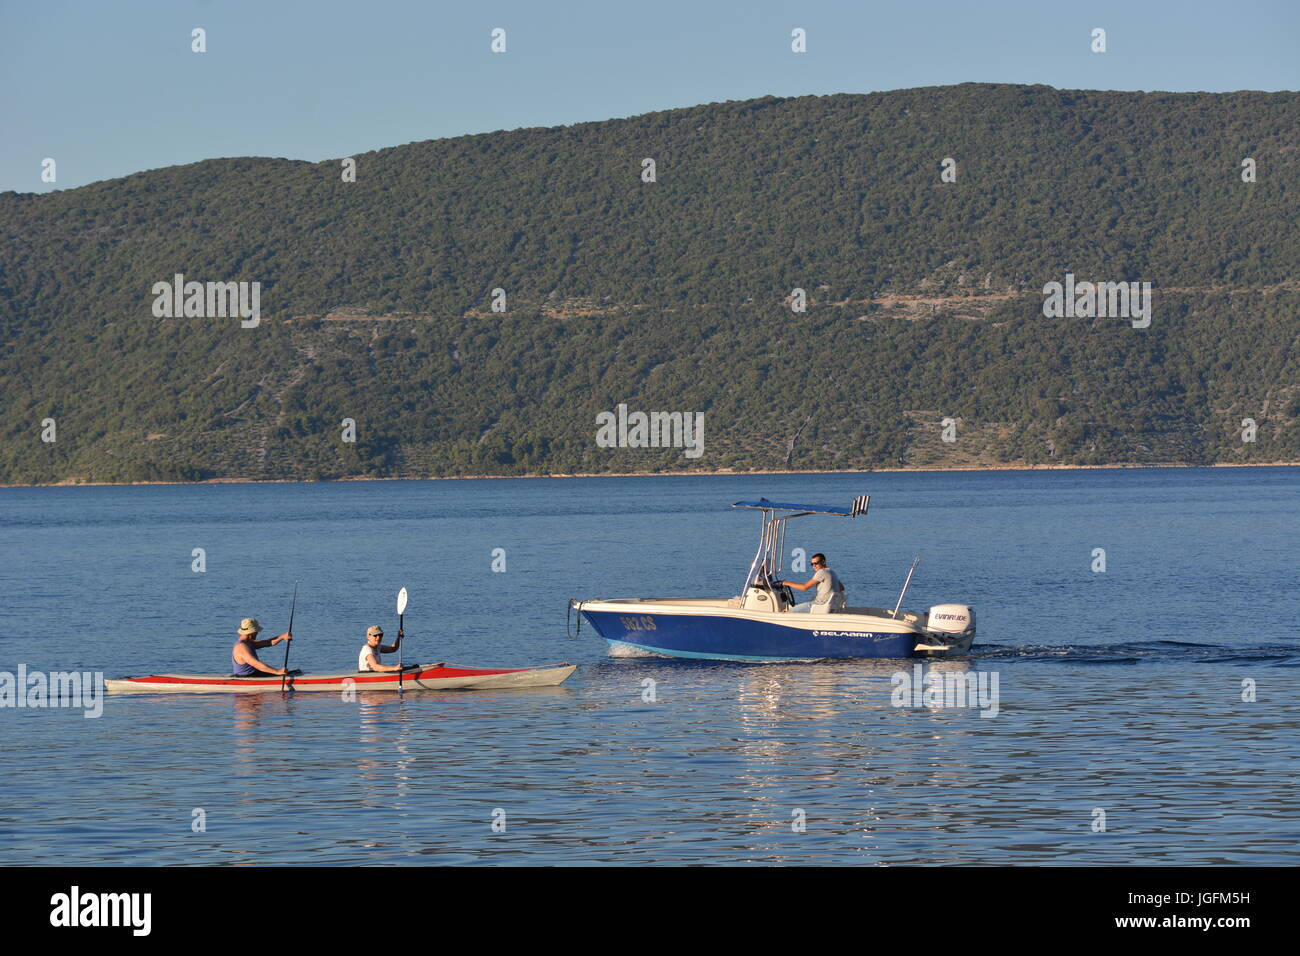 Cres, Croatia - June 18, 2017 - Motorboat near Valun on island Cres Stock Photo